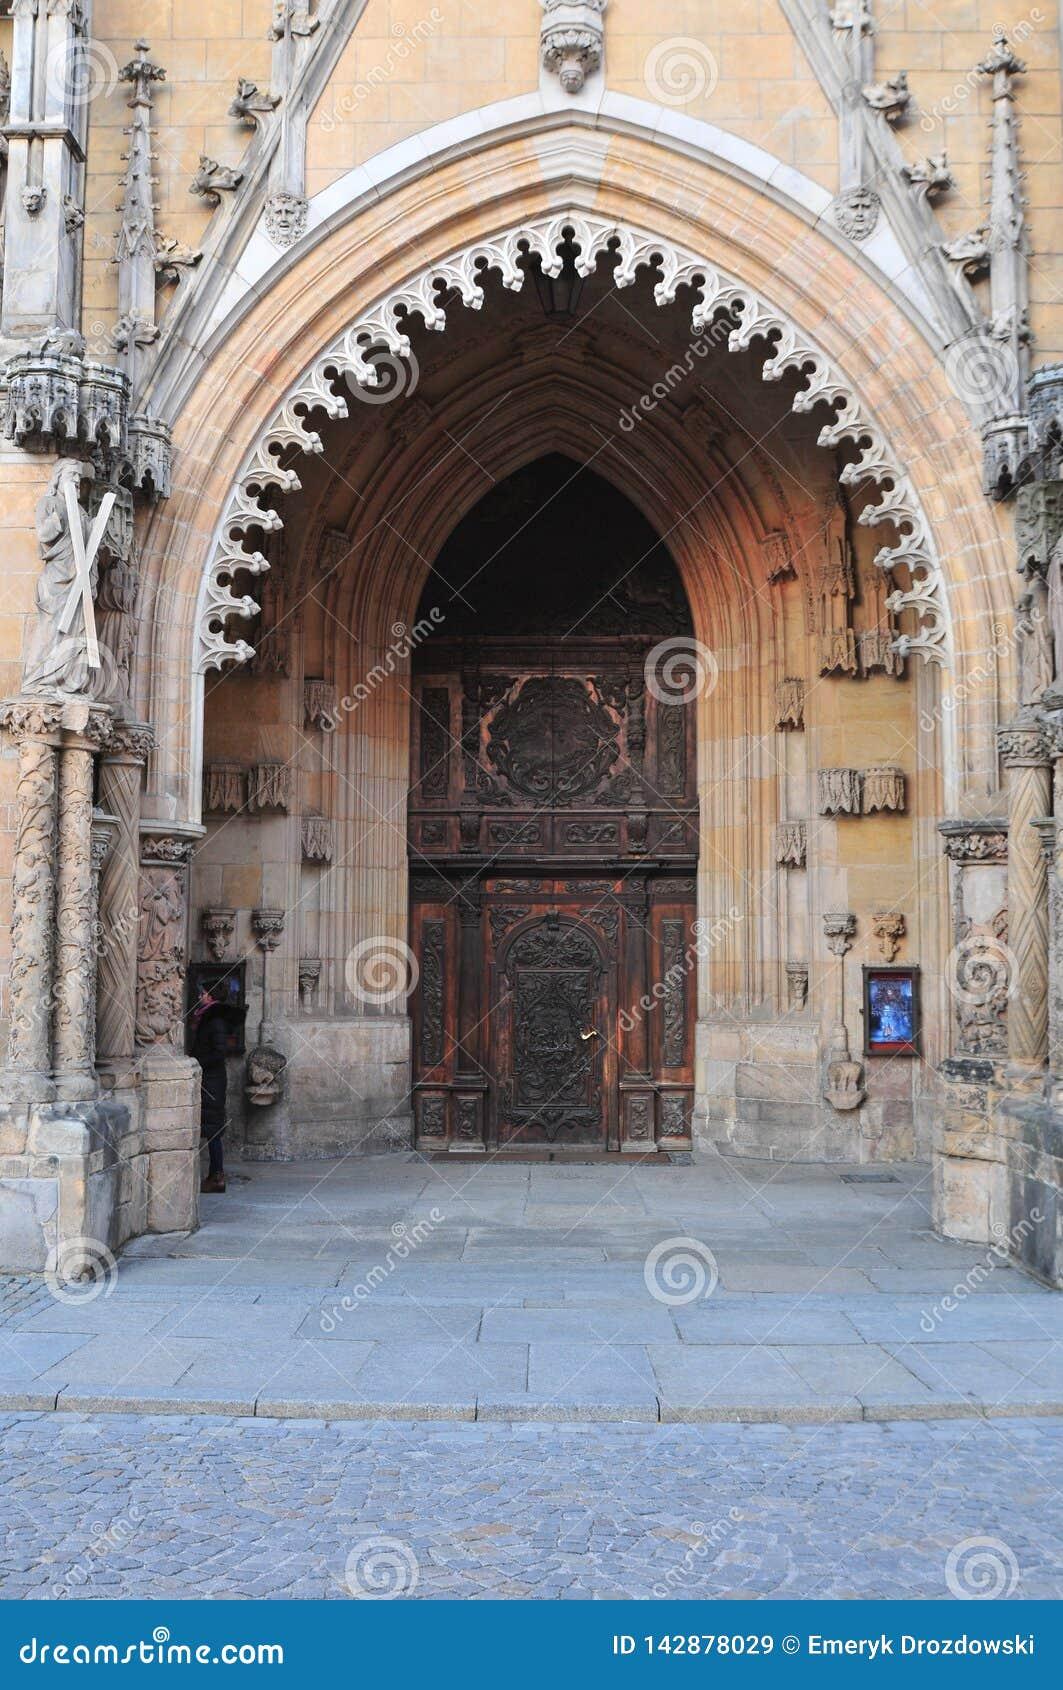 Haupteingang zur Kathedrale von Johannes Baptist Archikatedra Sw Jana Chrzciciela